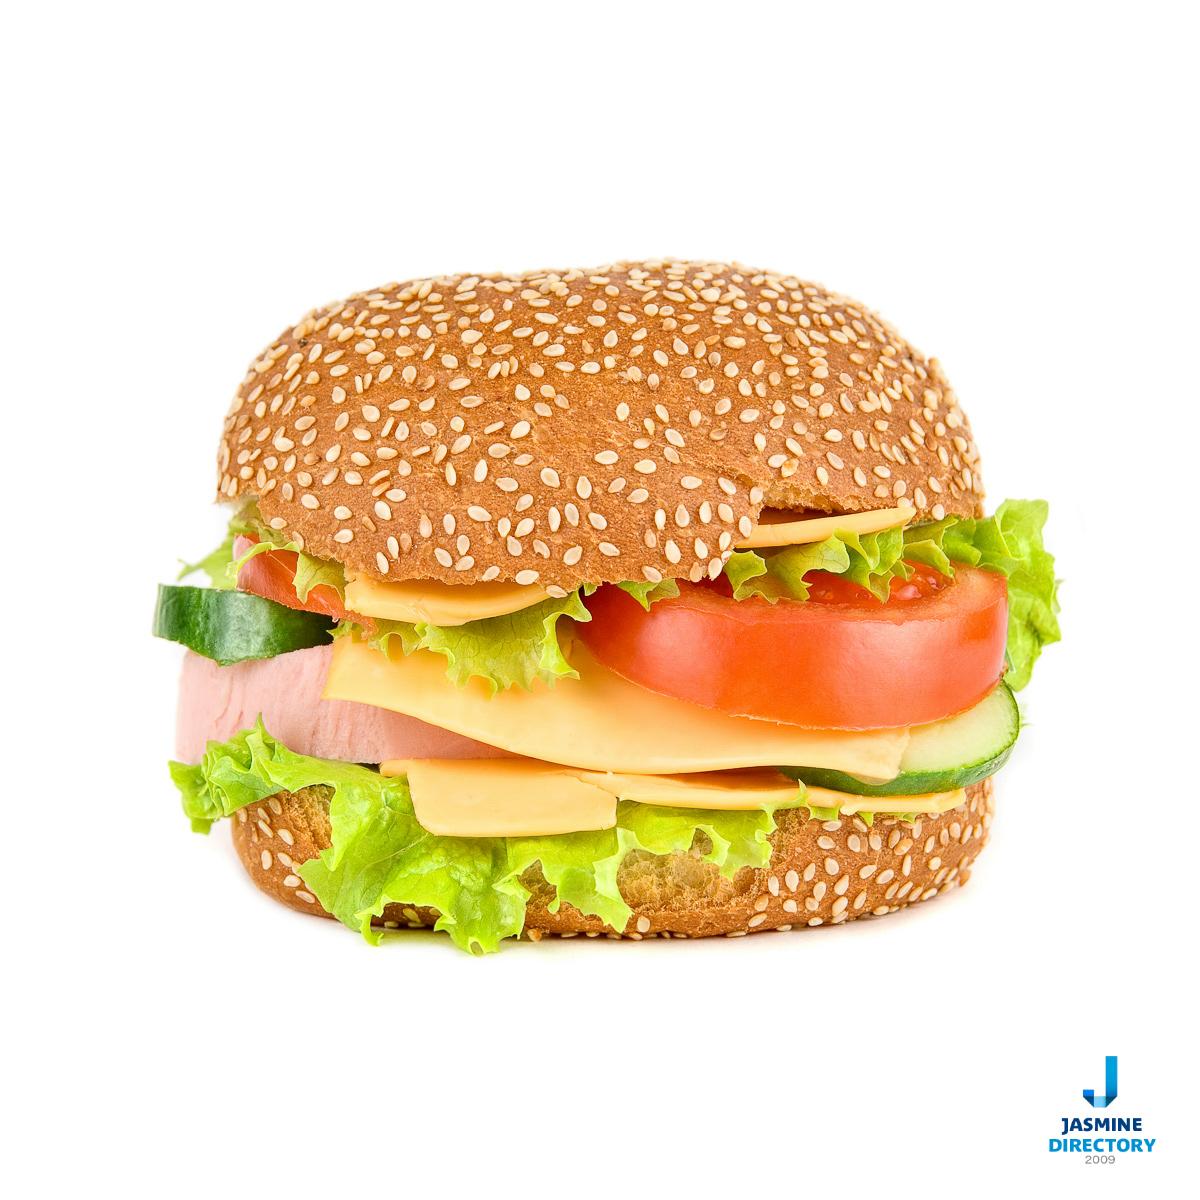 Hamburger-closeup-isolated-2